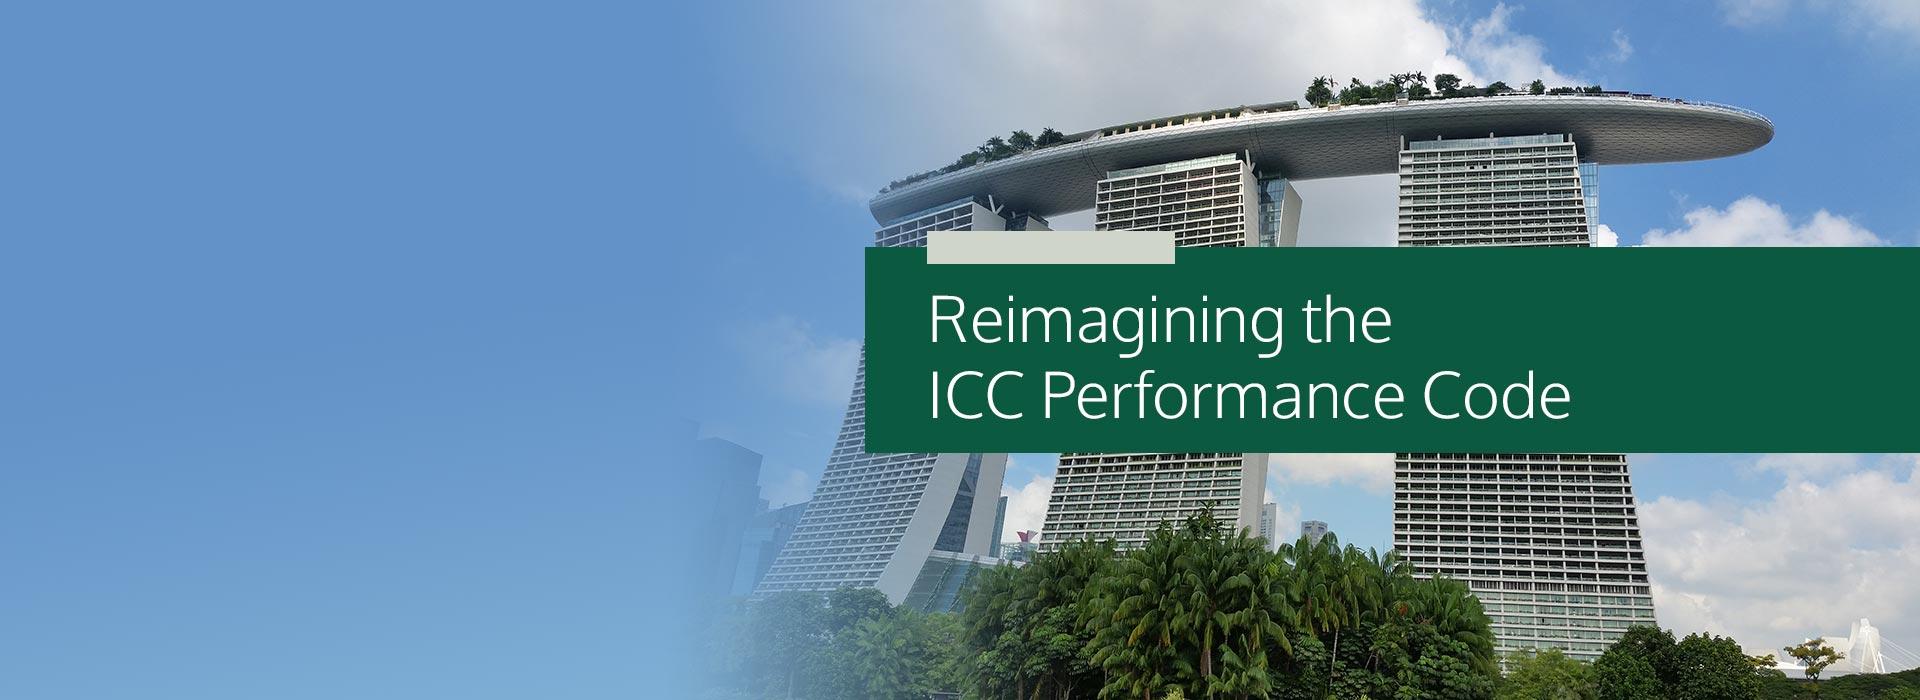 ICC Performance Code Resources